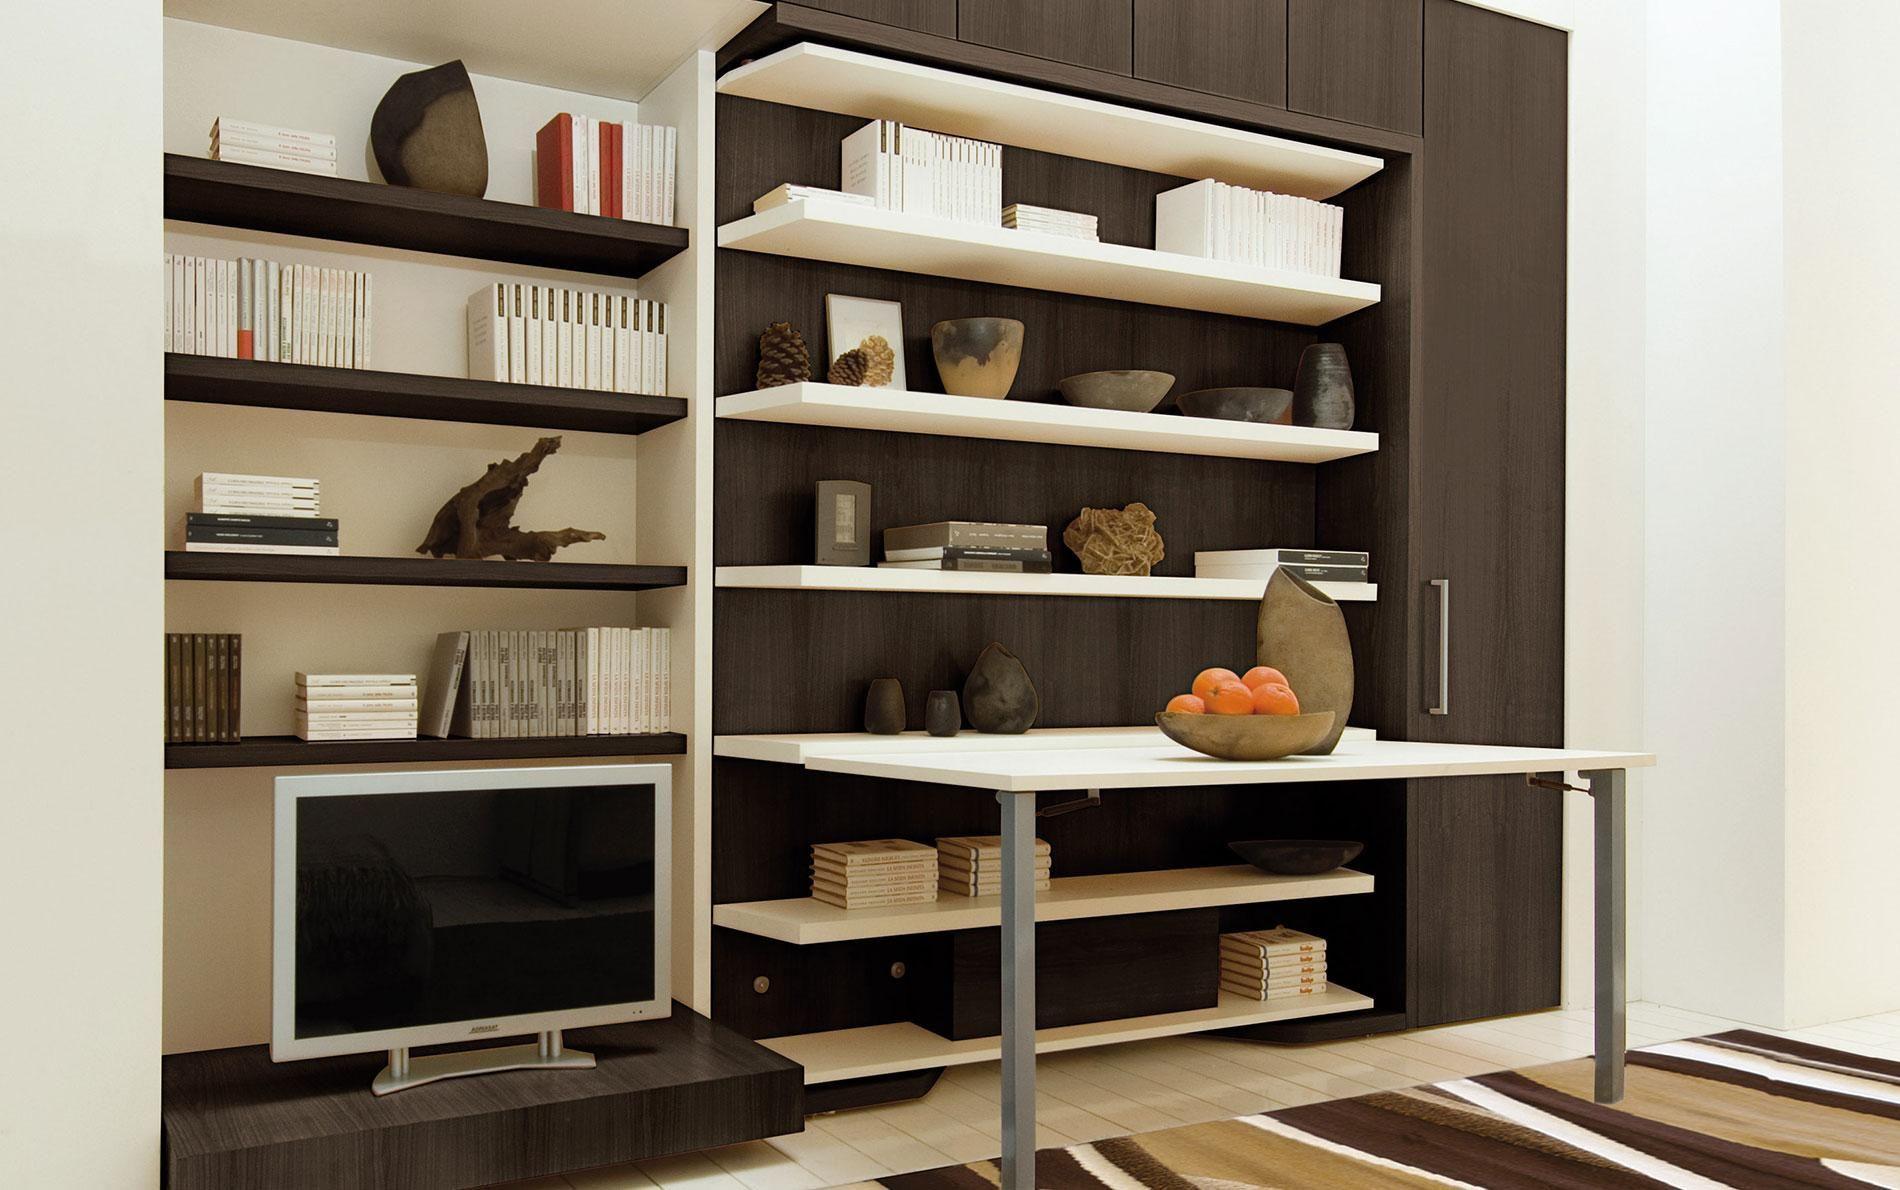 designer schrankbett lgm 01 moderne schrankbetten pinterest. Black Bedroom Furniture Sets. Home Design Ideas